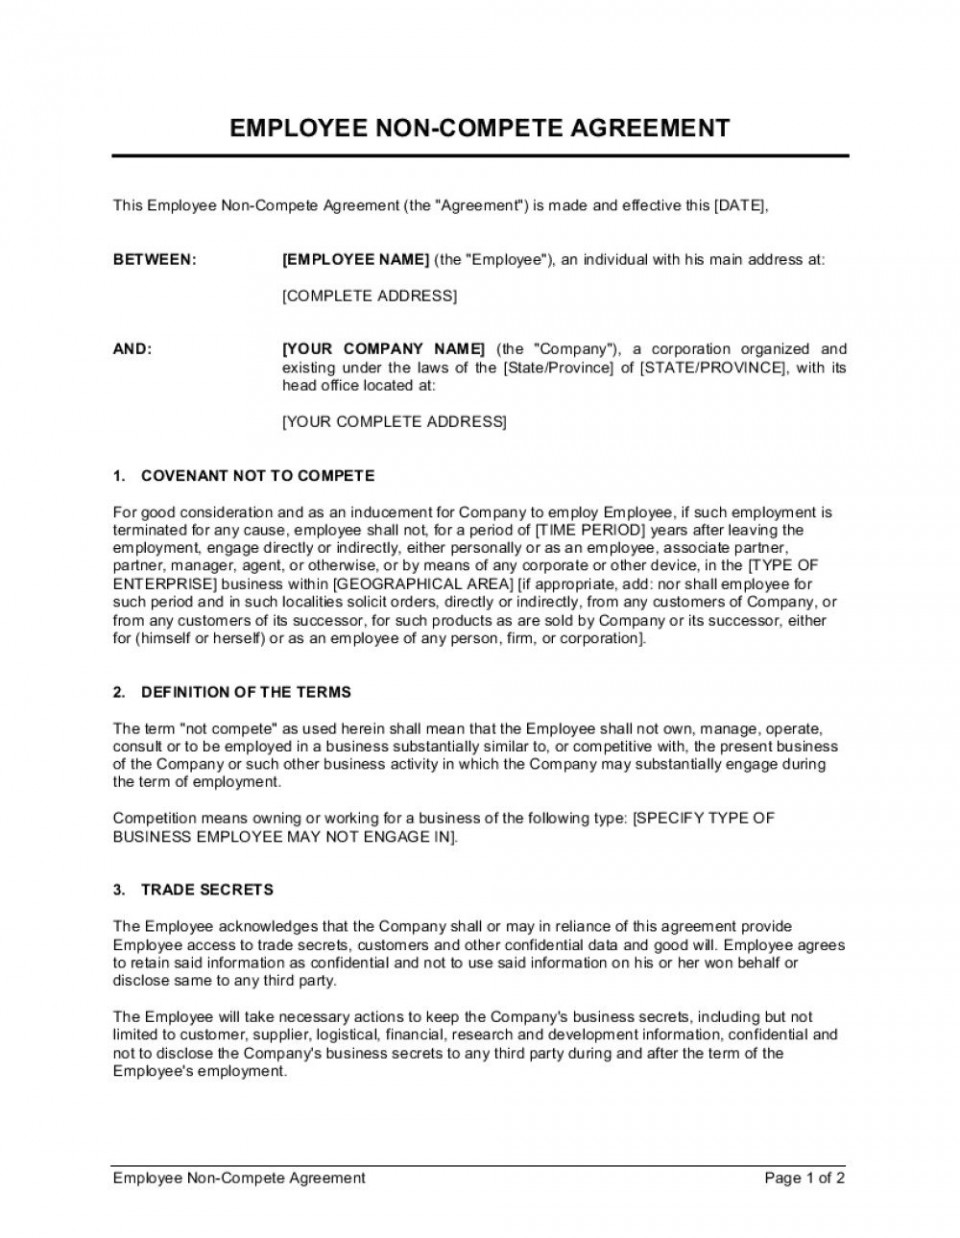 001 Impressive Employee Non Compete Agreement Template Concept  Disclosure Free960